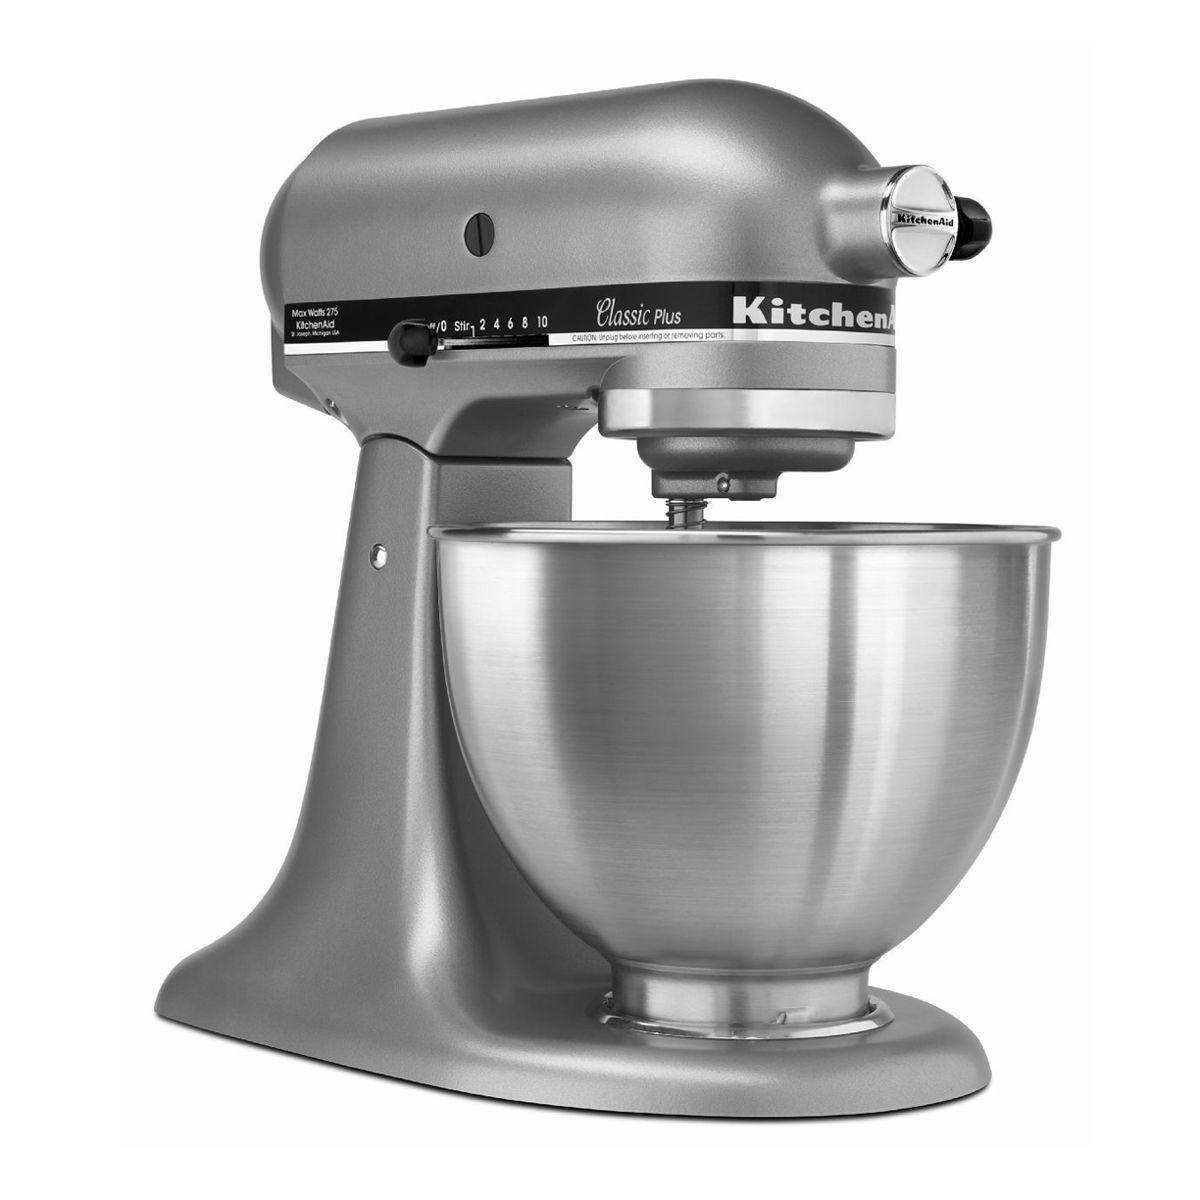 stand mixers eBay - akross.info